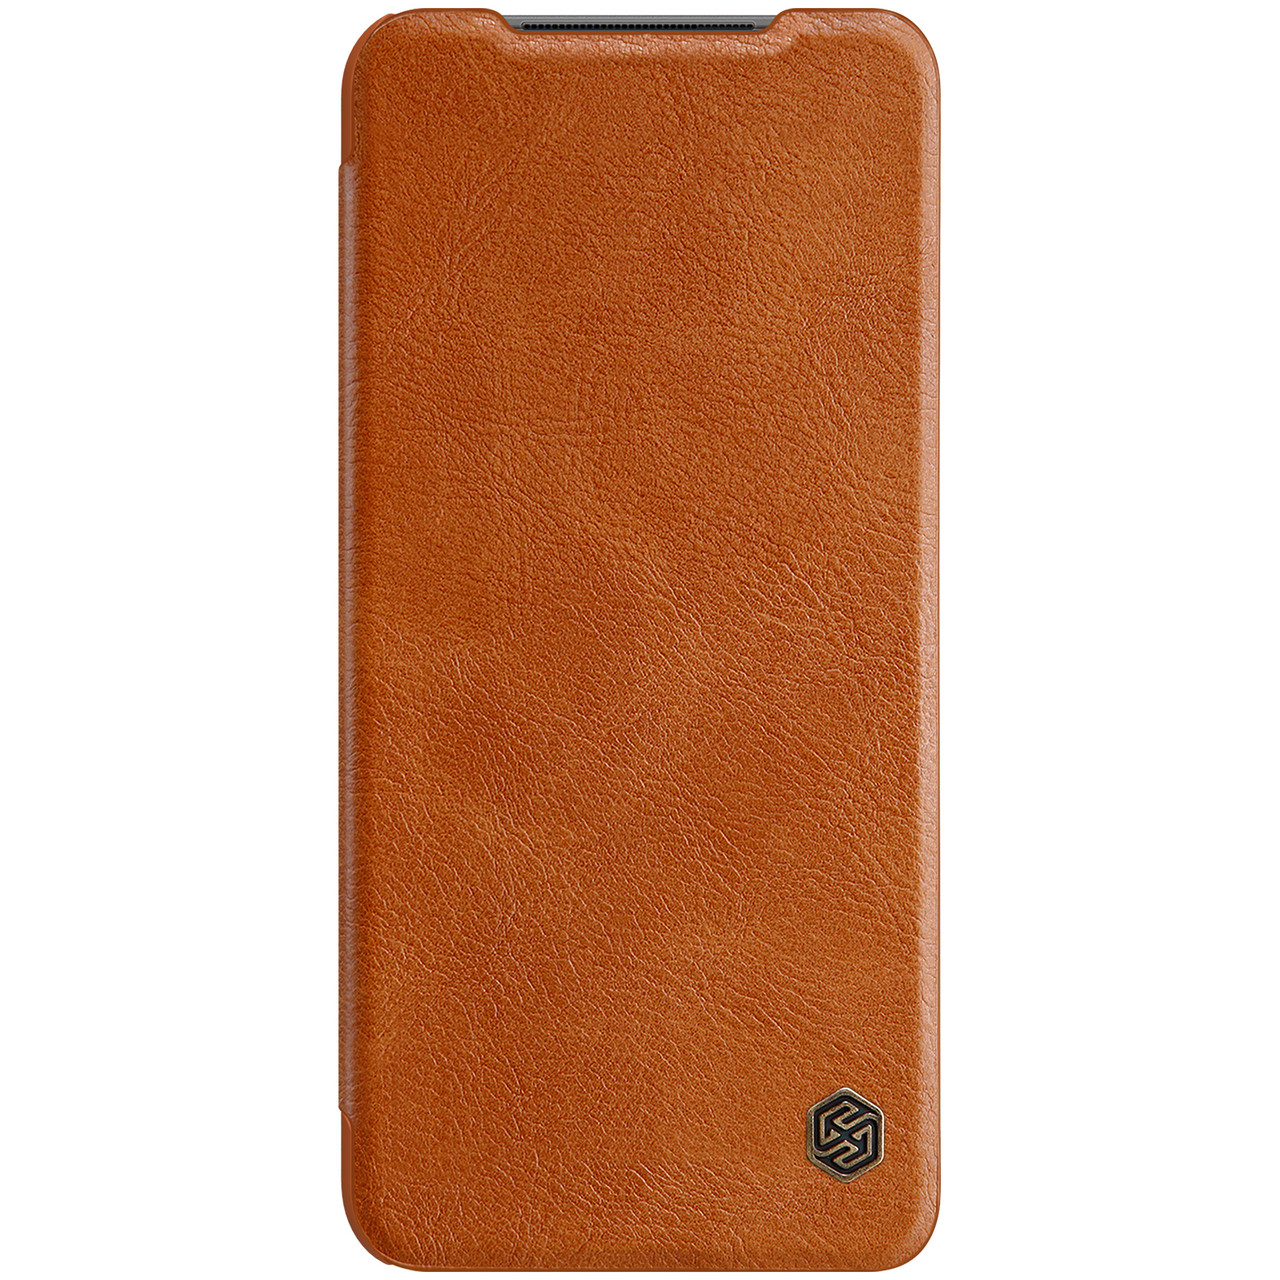 Защитный чехол-книжка Nillkin для Xiaomi Redmi Note 10 4G Qin leather case Brown Коричневый